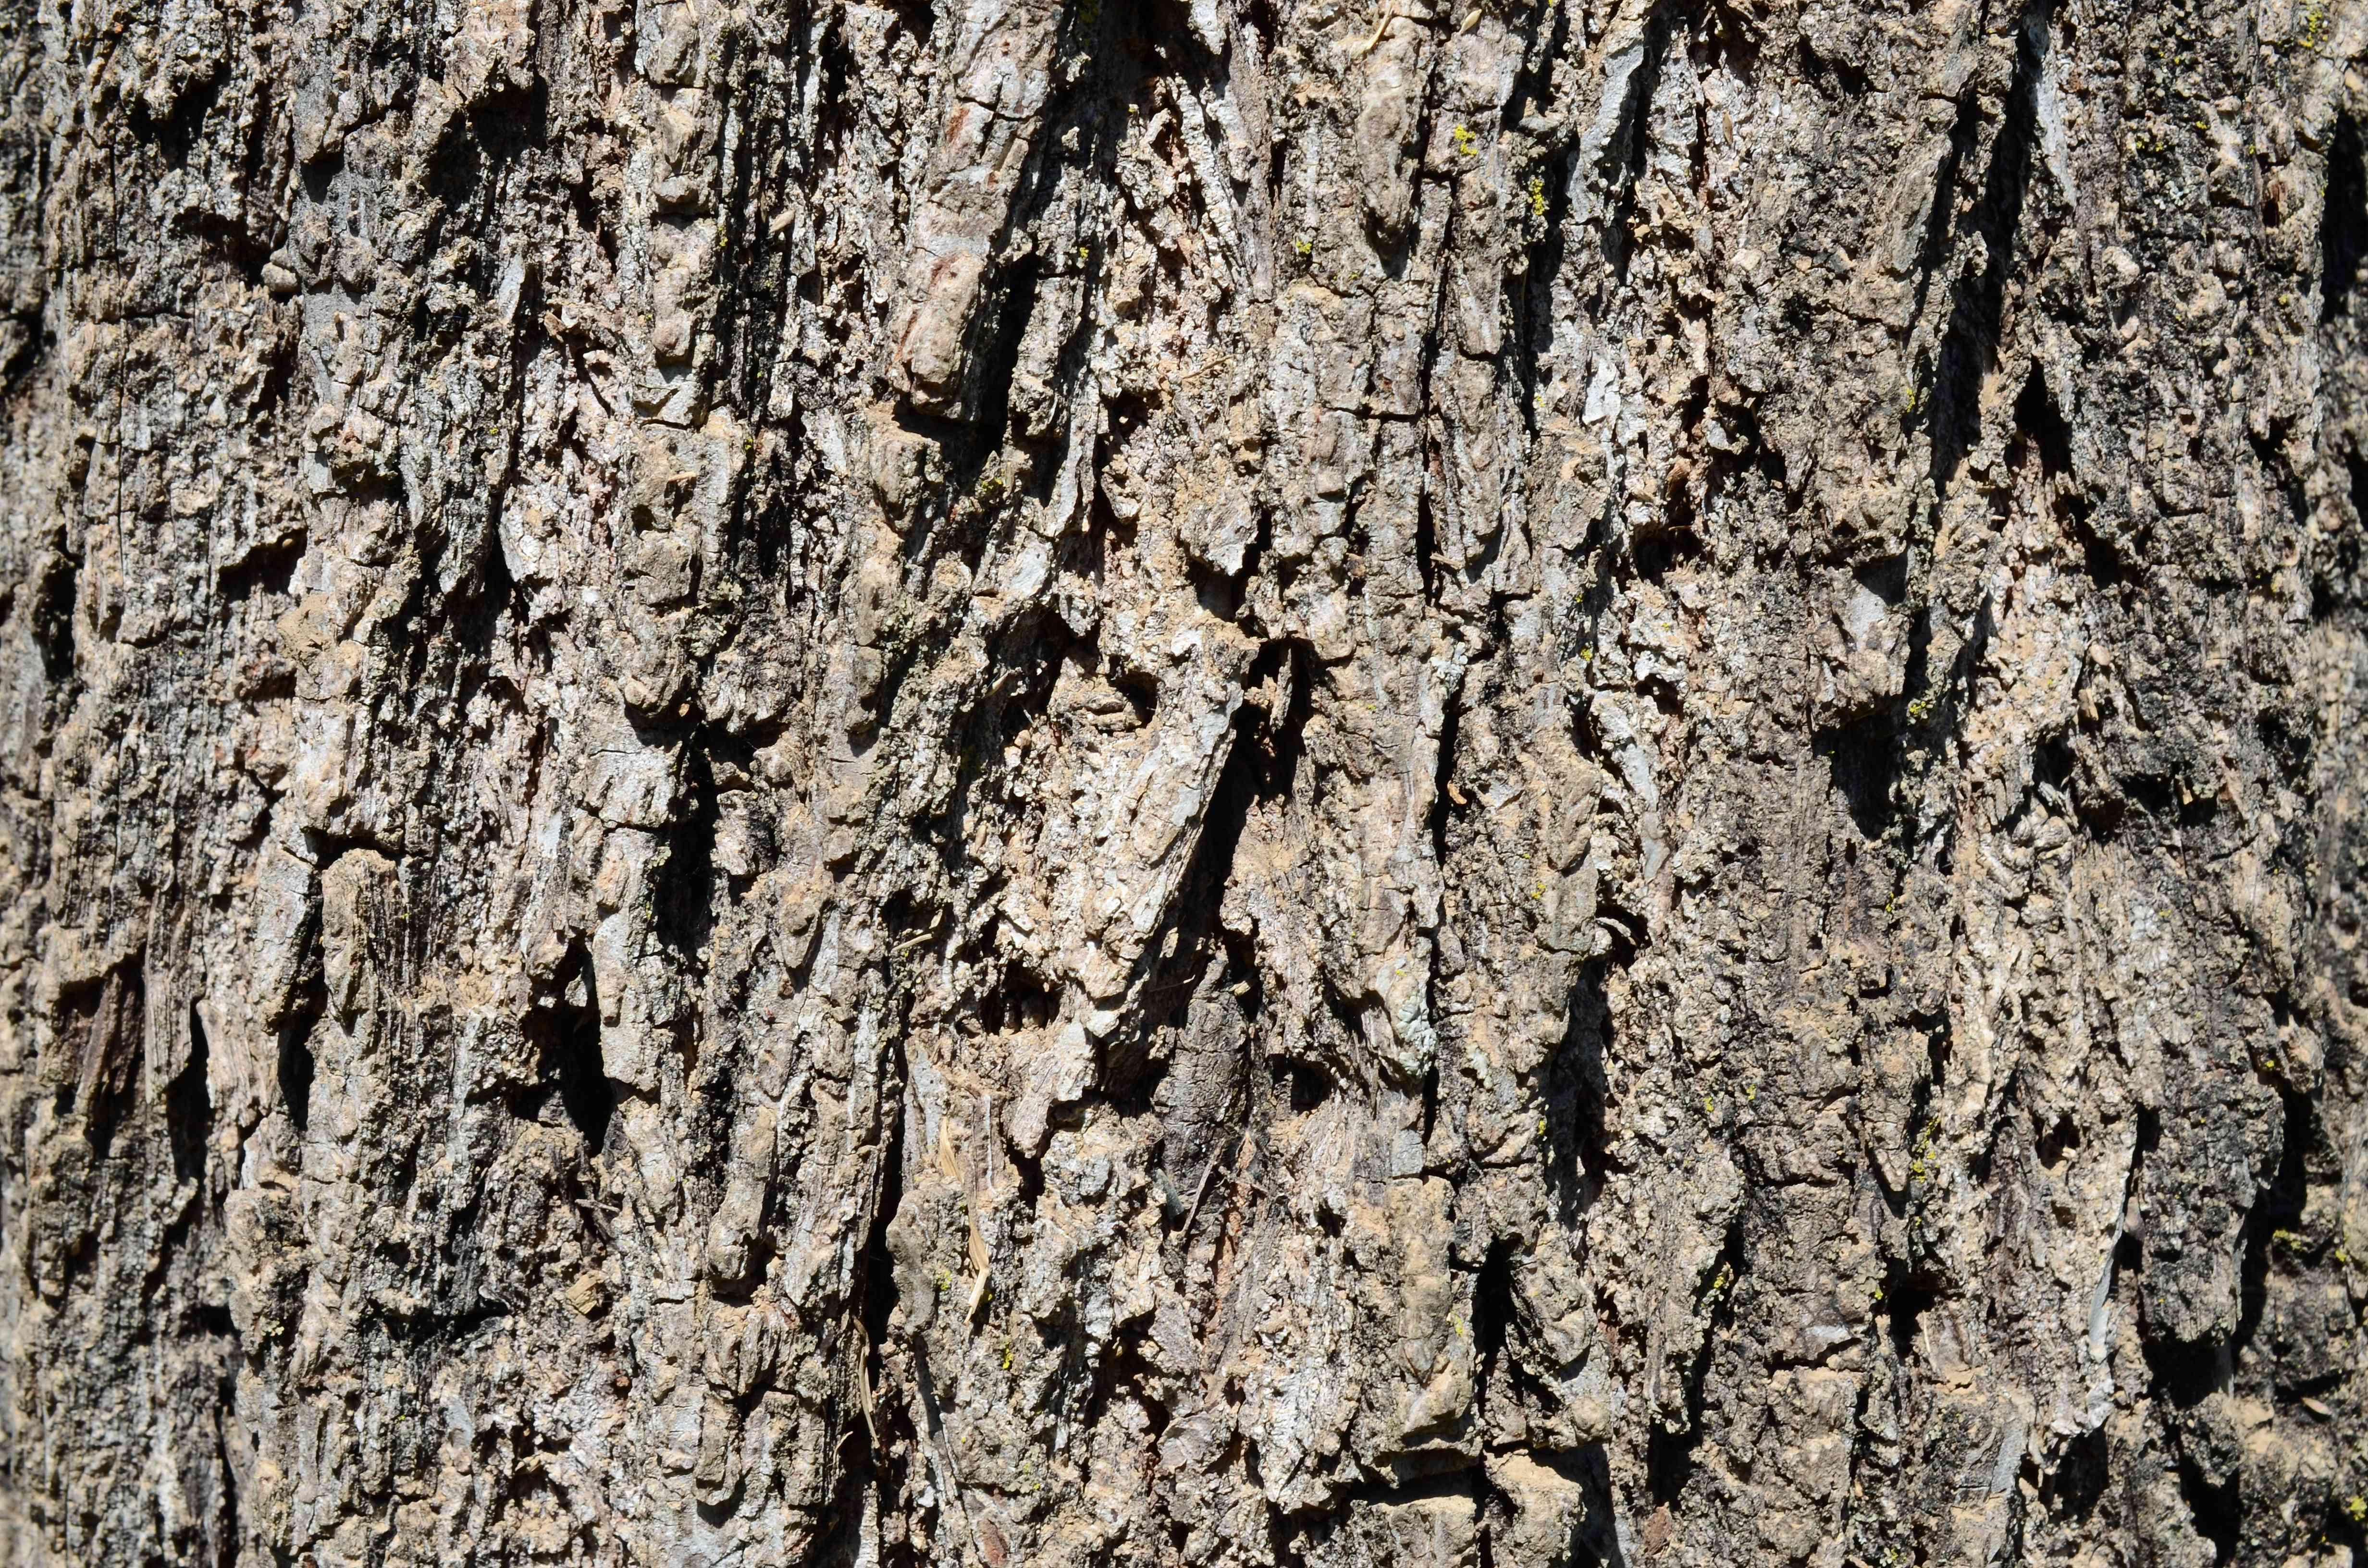 Close up of the bark of a black walnut tree